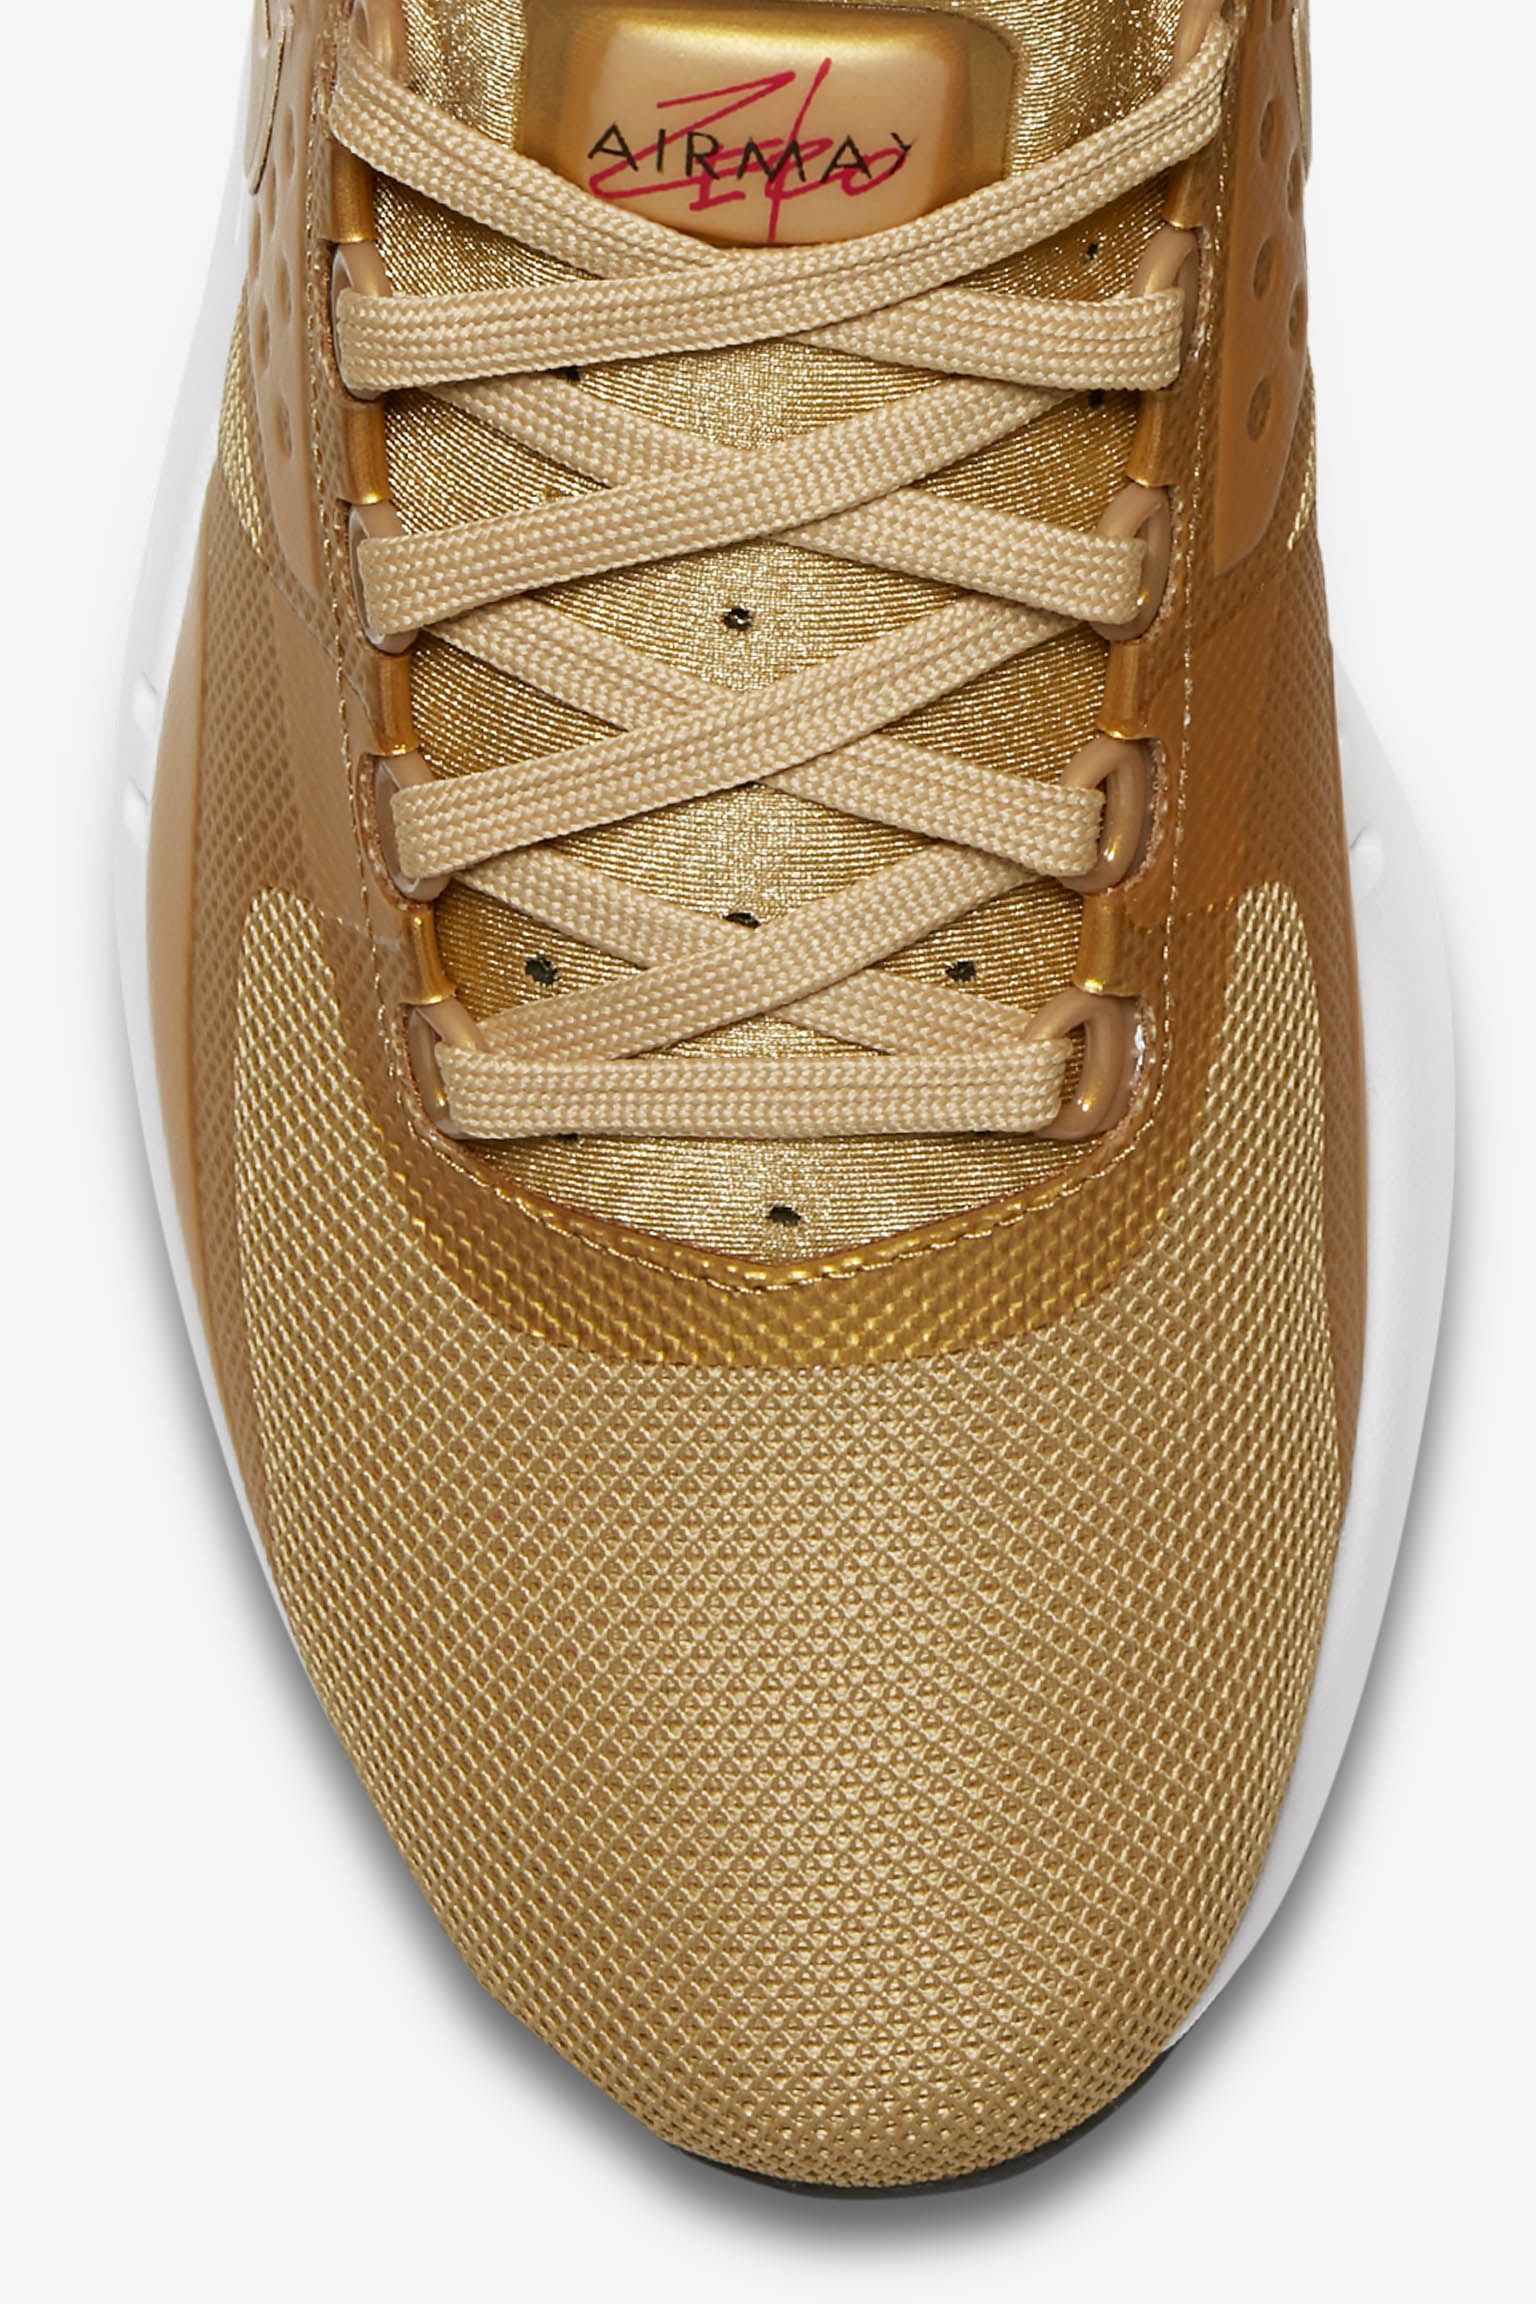 3a636386bc ... buy nike air max zero metallic gold release date d41e8 646f2